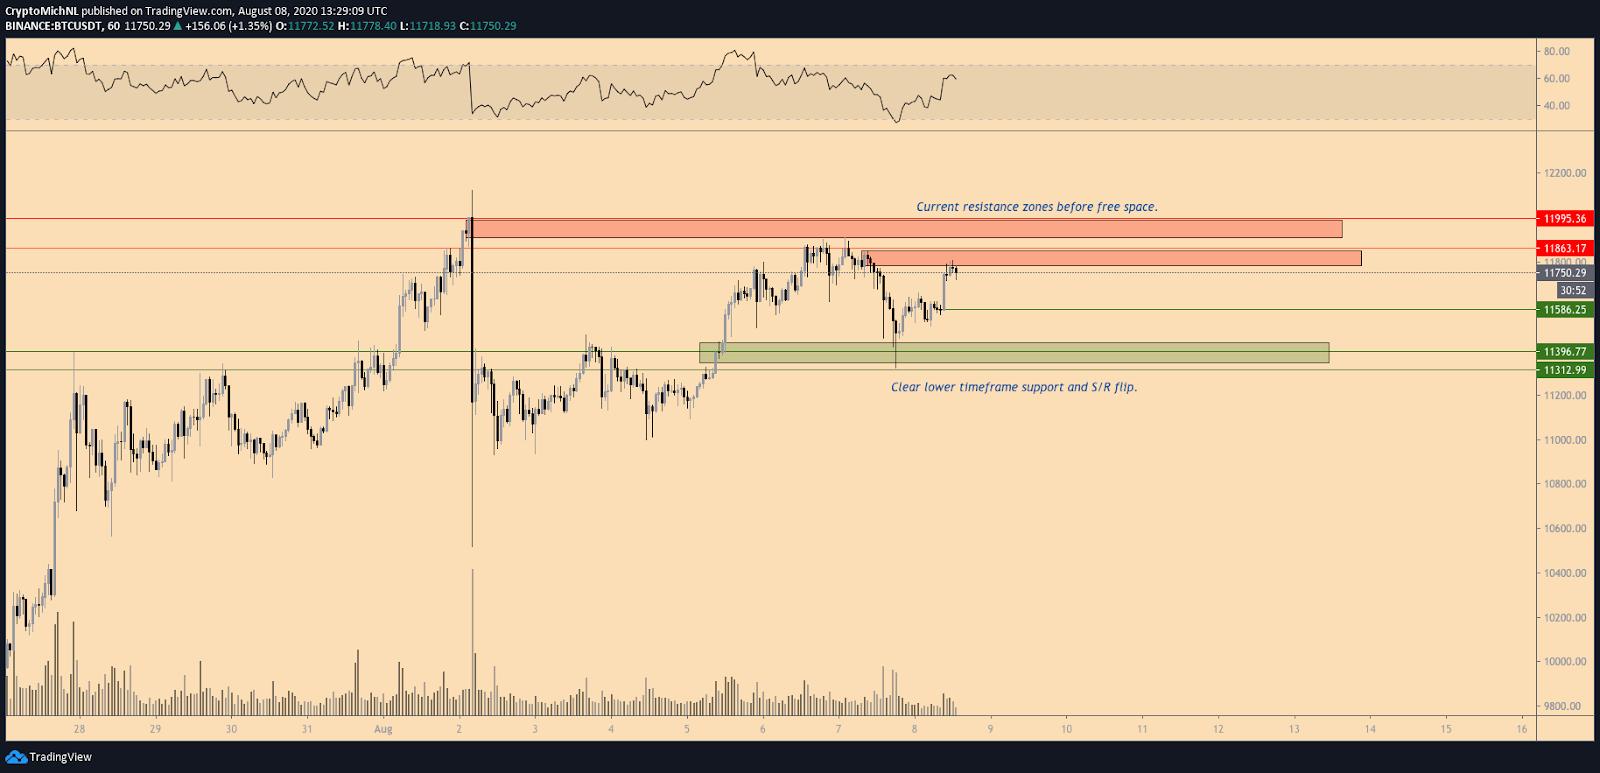 BTC/USD 2-hour chart